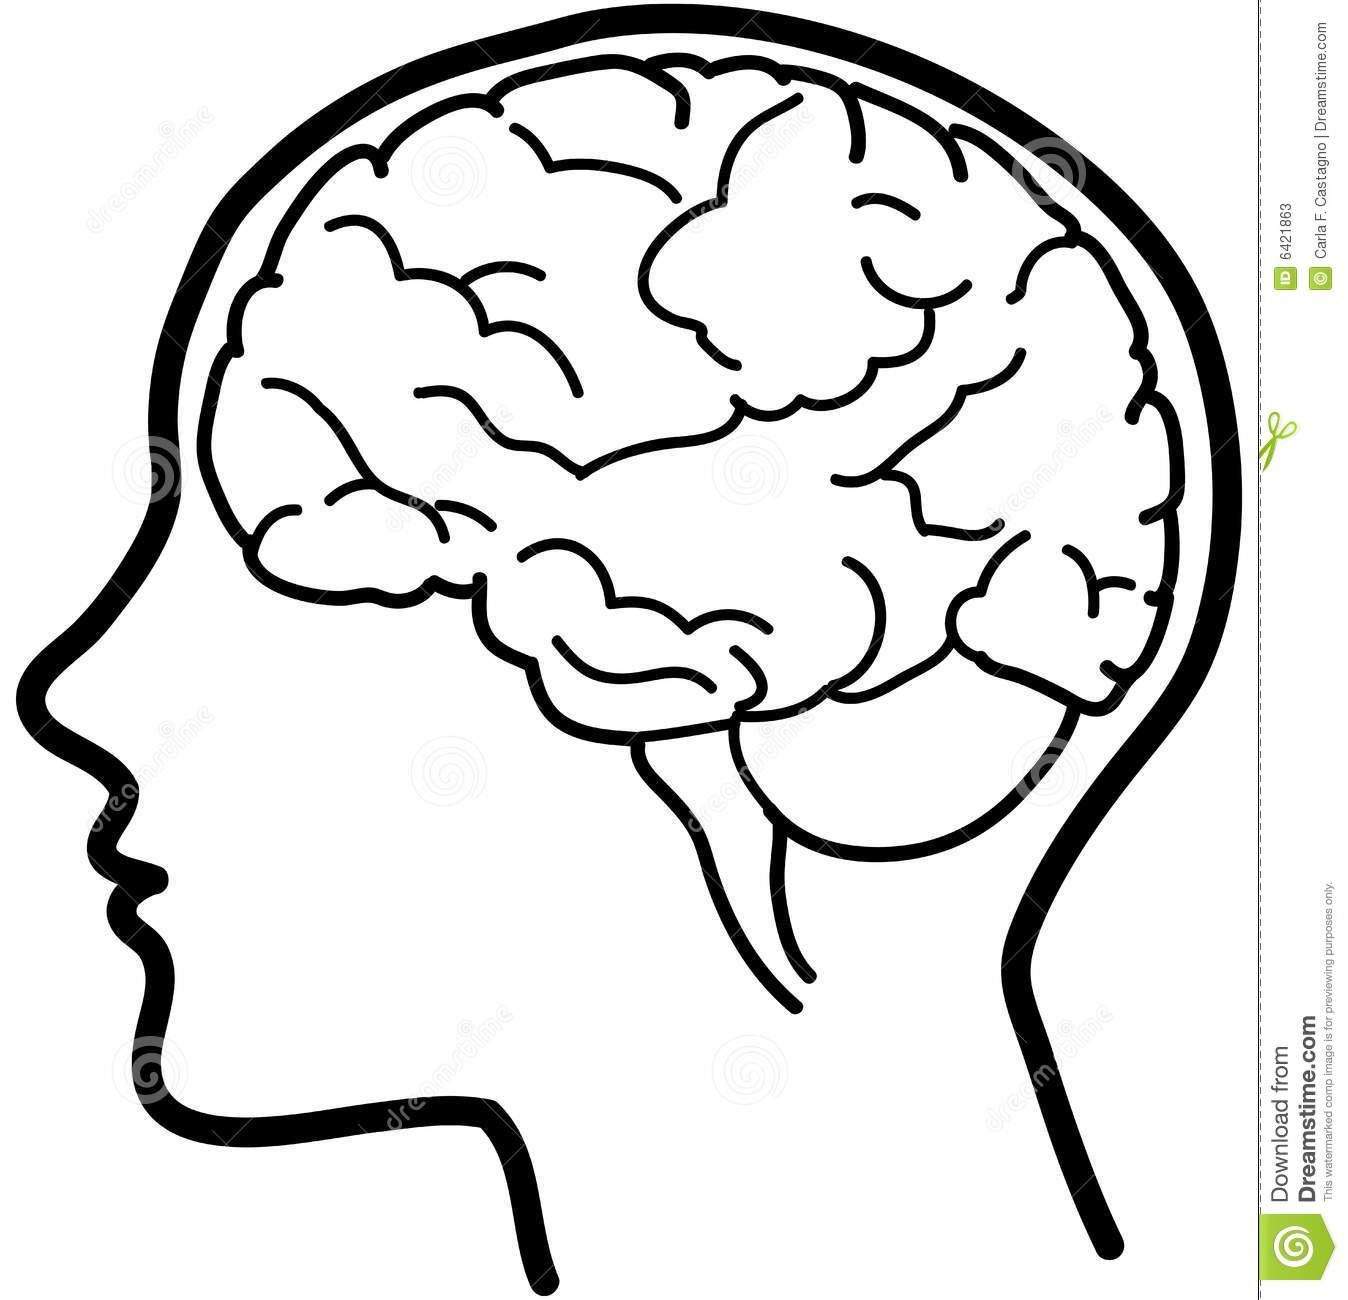 1348x1300 sai nath neuro clinic, neurology clinic in malakpet, hyderabad